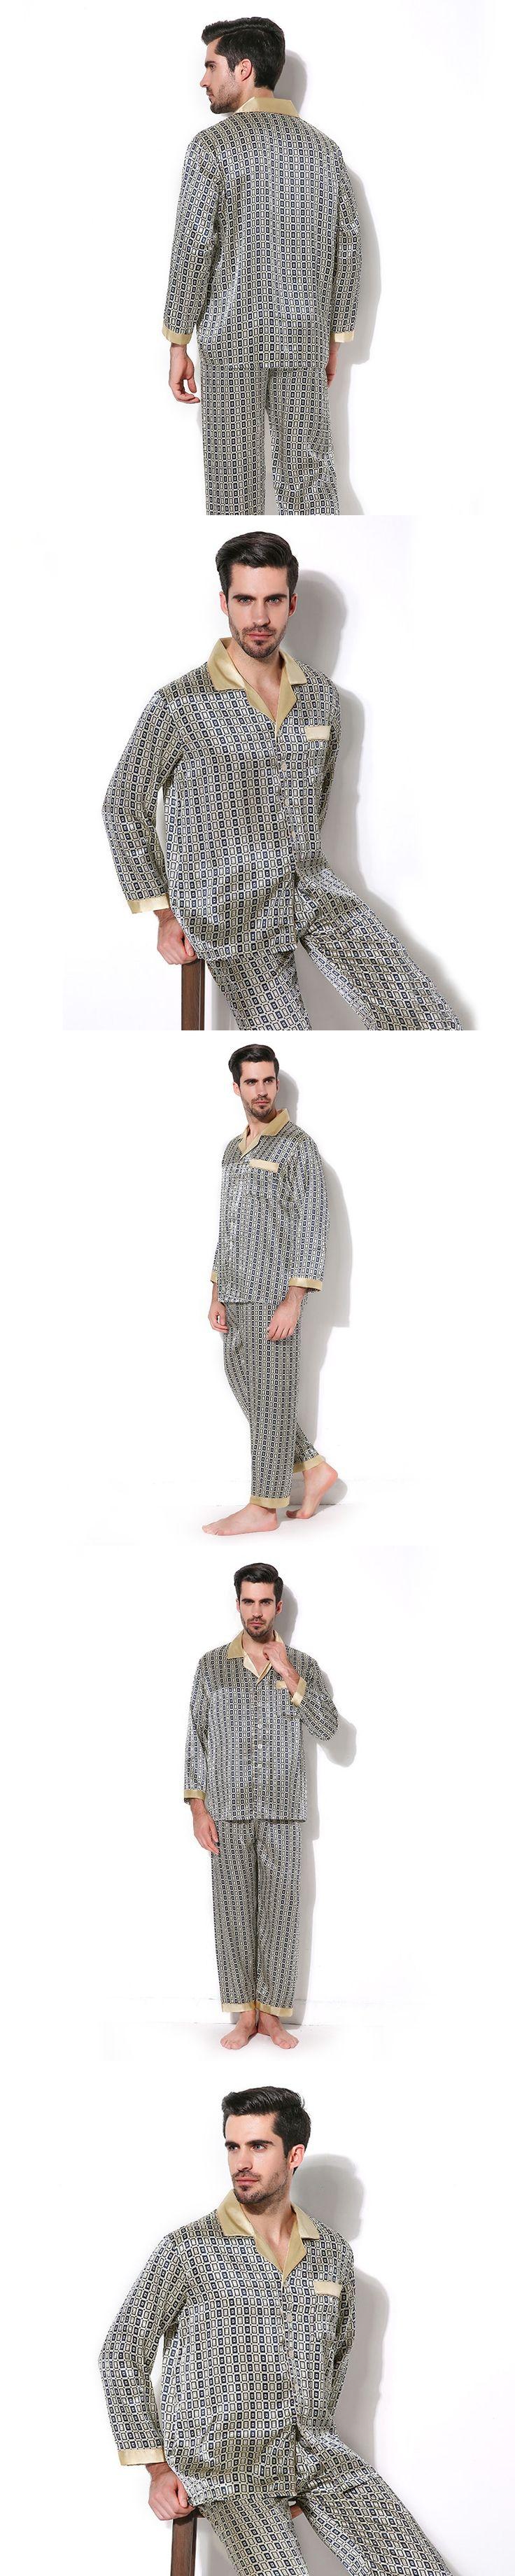 Luxury Male Sleepwear 100% Silk Long-Sleeve Men Pyjamas Pajama Sets Pants Autumn Men Silk Pajamas Set CMR16067